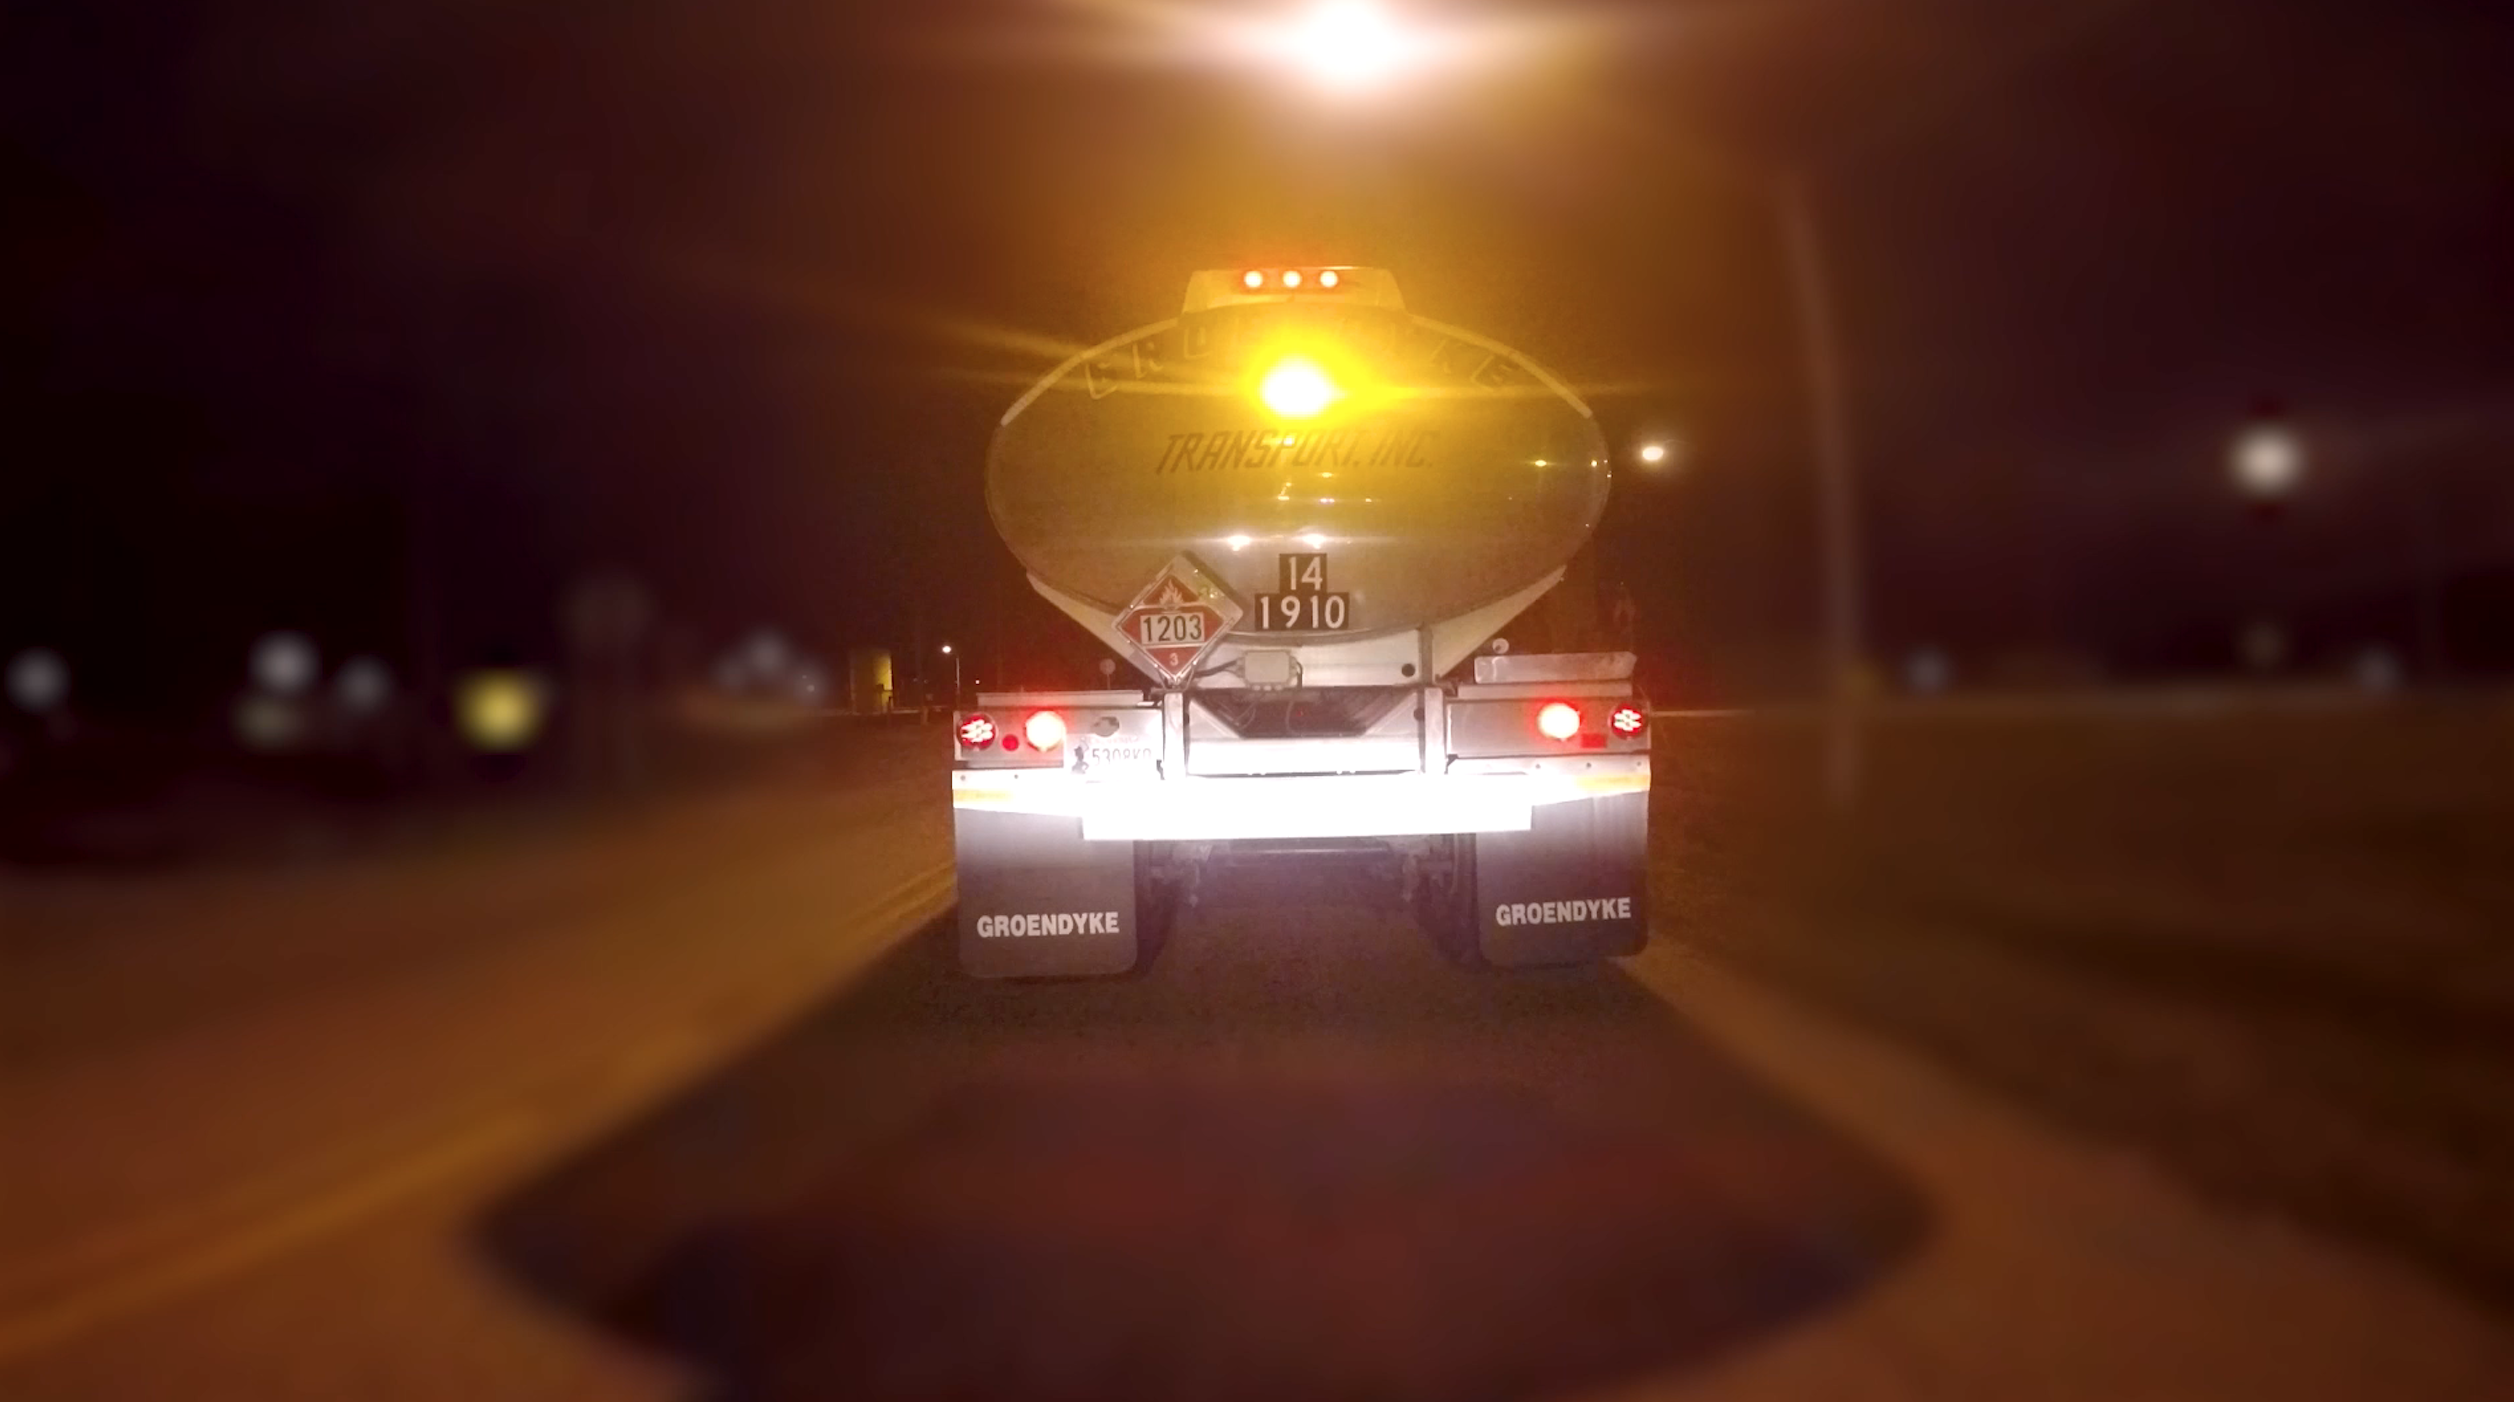 groendyke transport tanker featuring pulsating brake light at night